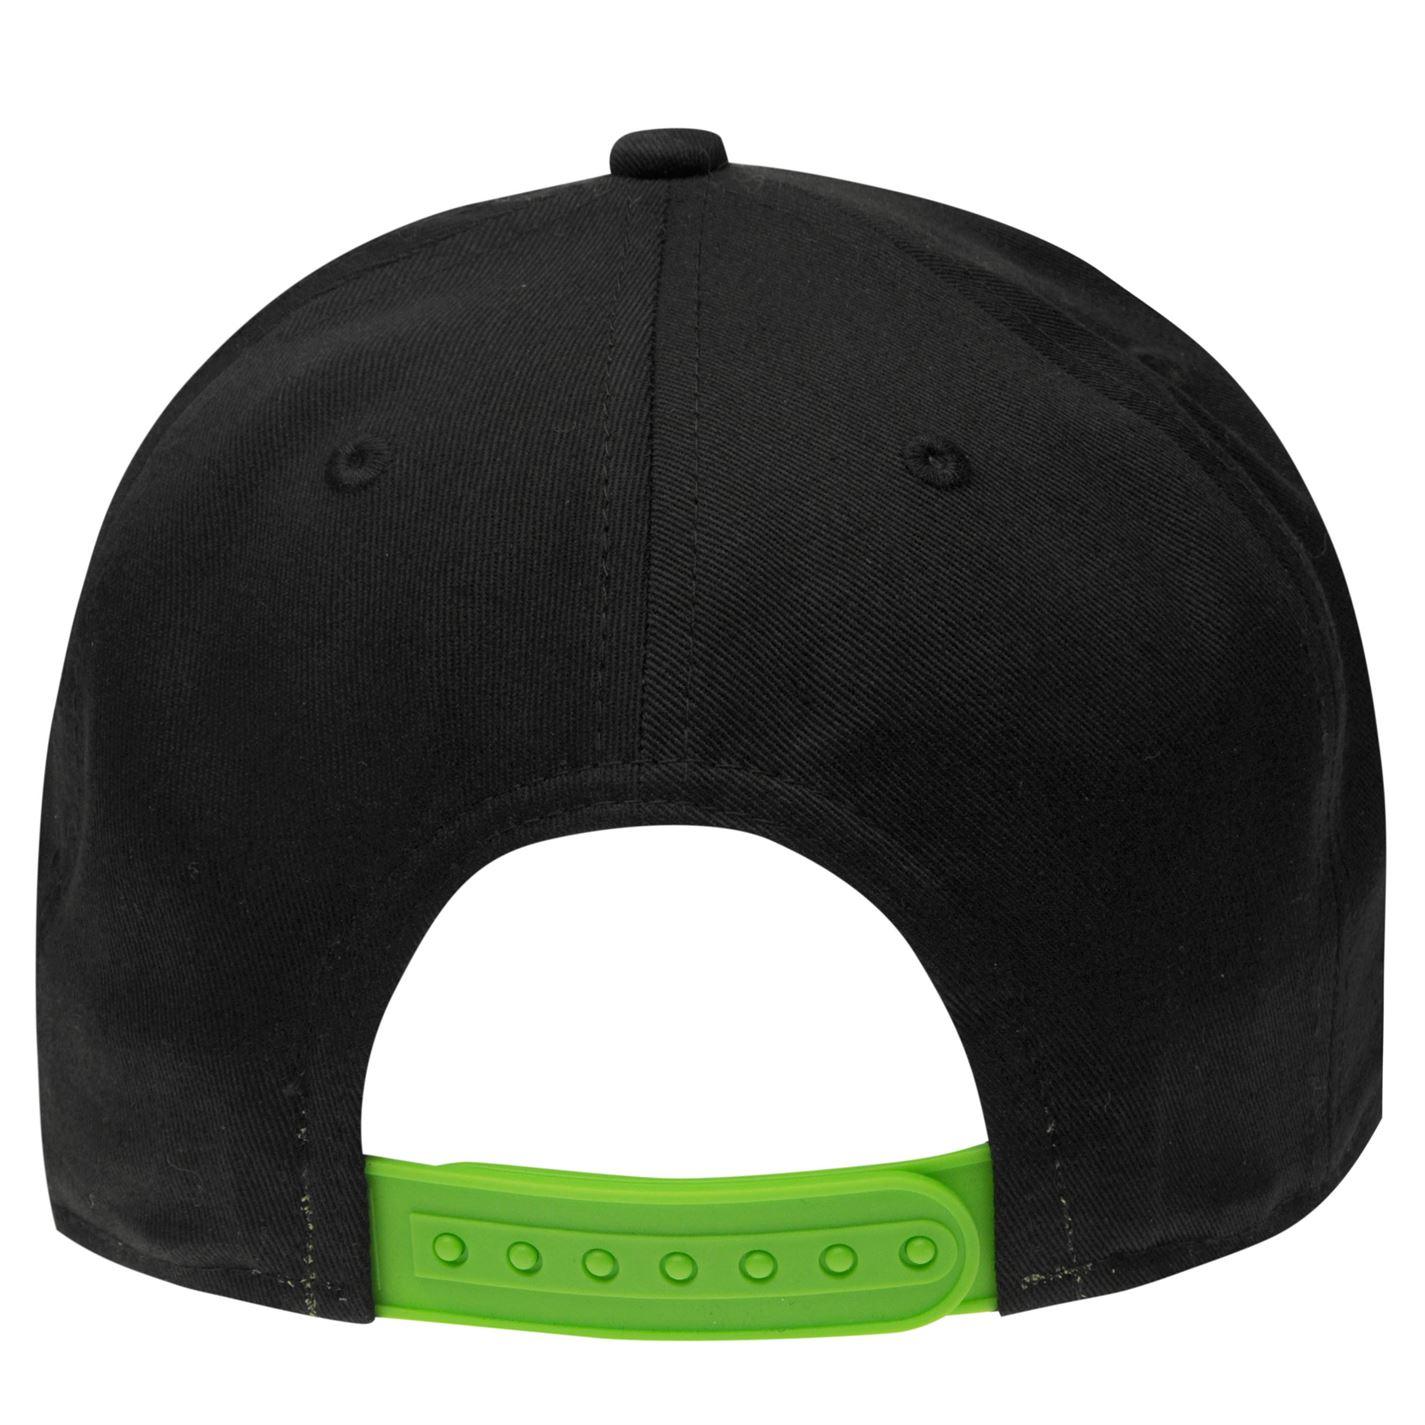 No Fear Childrens Snap Back Cap Hat Casual Headgear Flat Cover Top Accessory